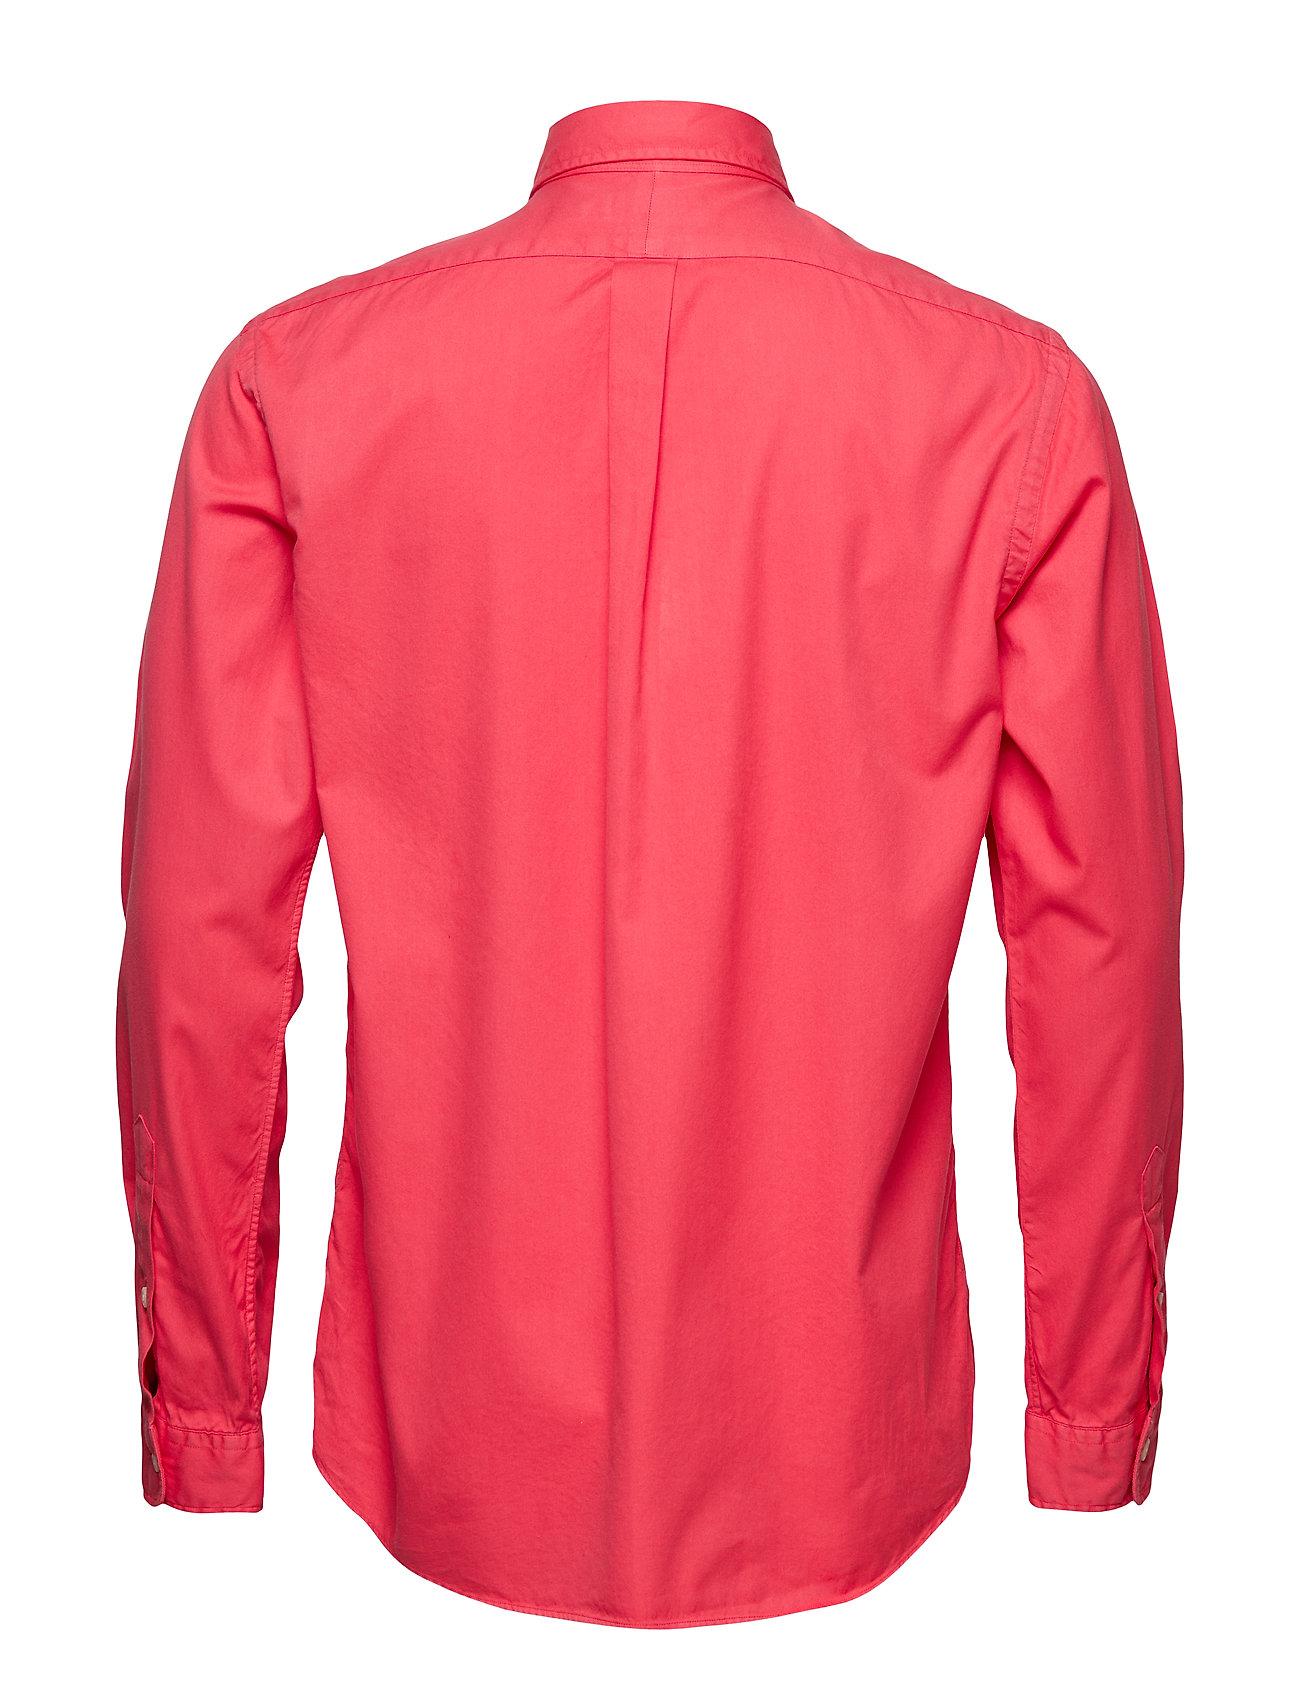 sport FlowerPolo Lauren Sleeve Ppc long Ralph Shirtcactus Sp Bd 5R3LjA4